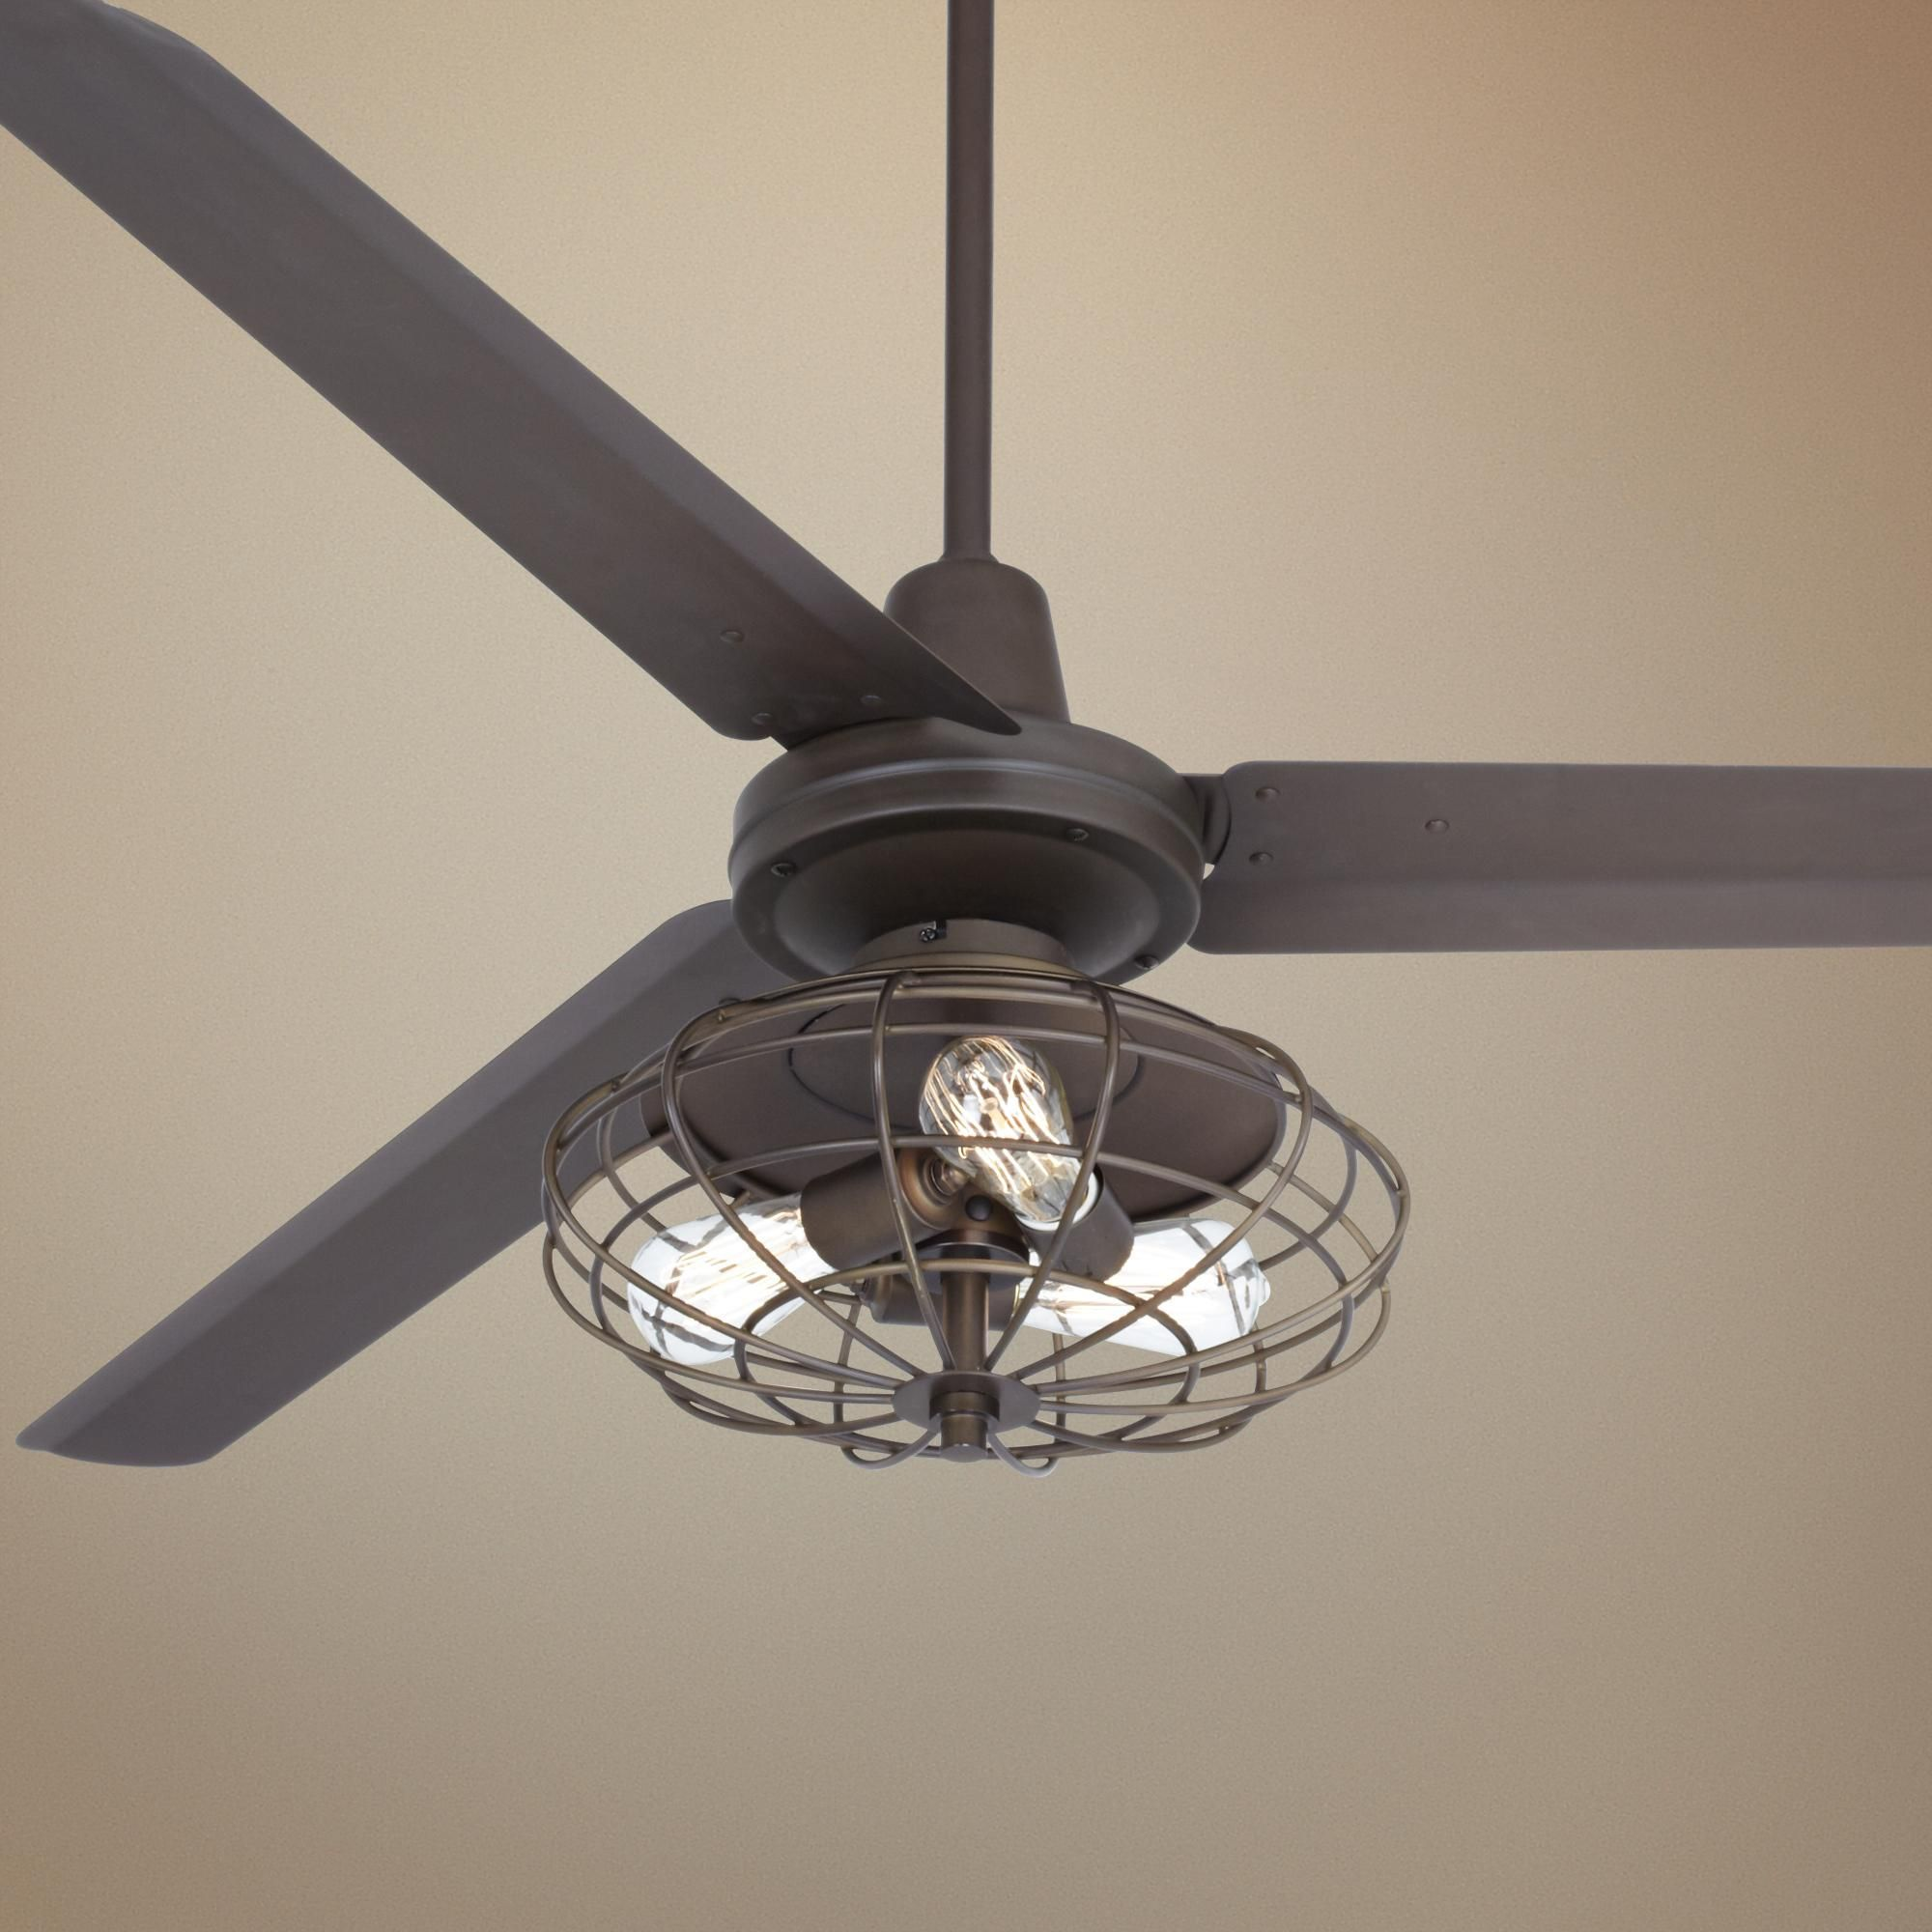 60 turbina industrial oil rubbed bronze ceiling fan upper lever great room